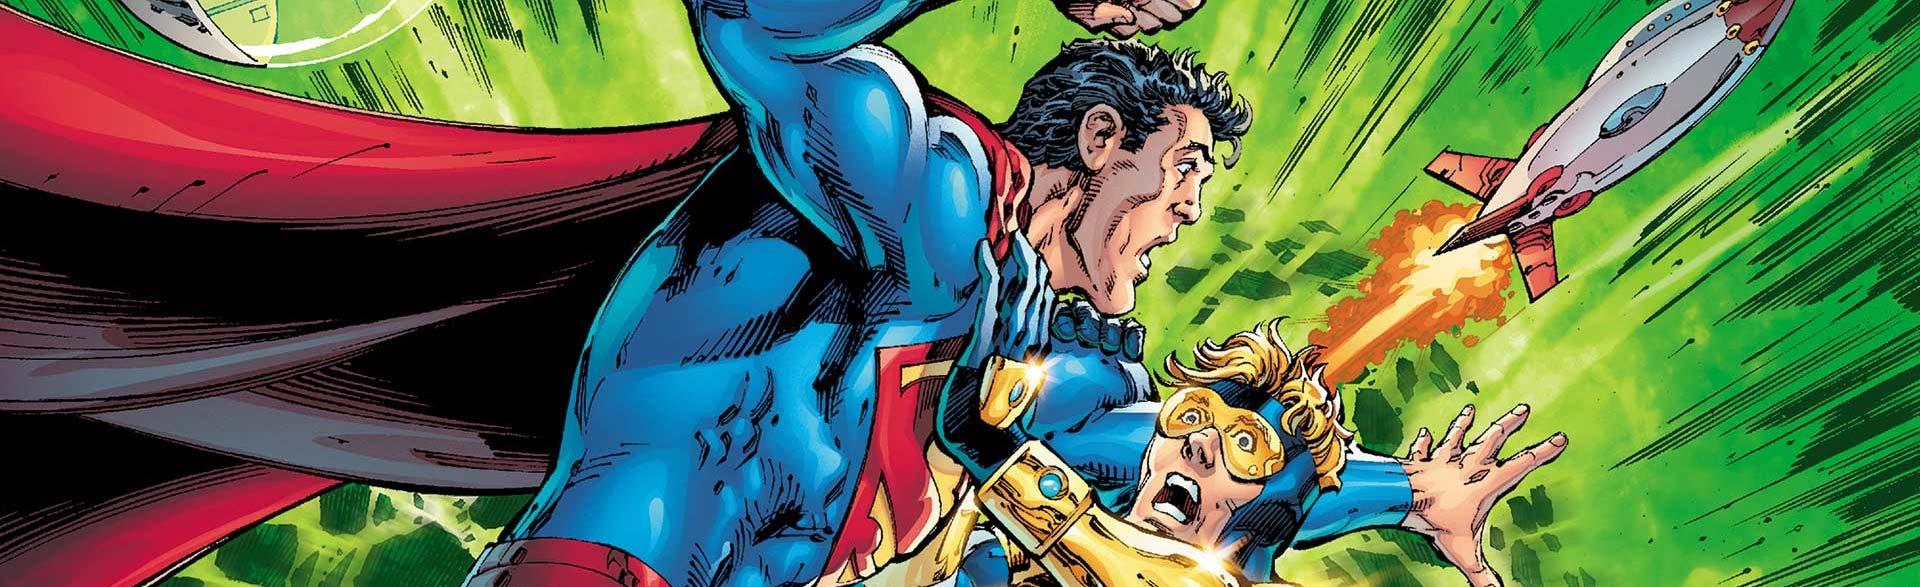 Action Comics 993